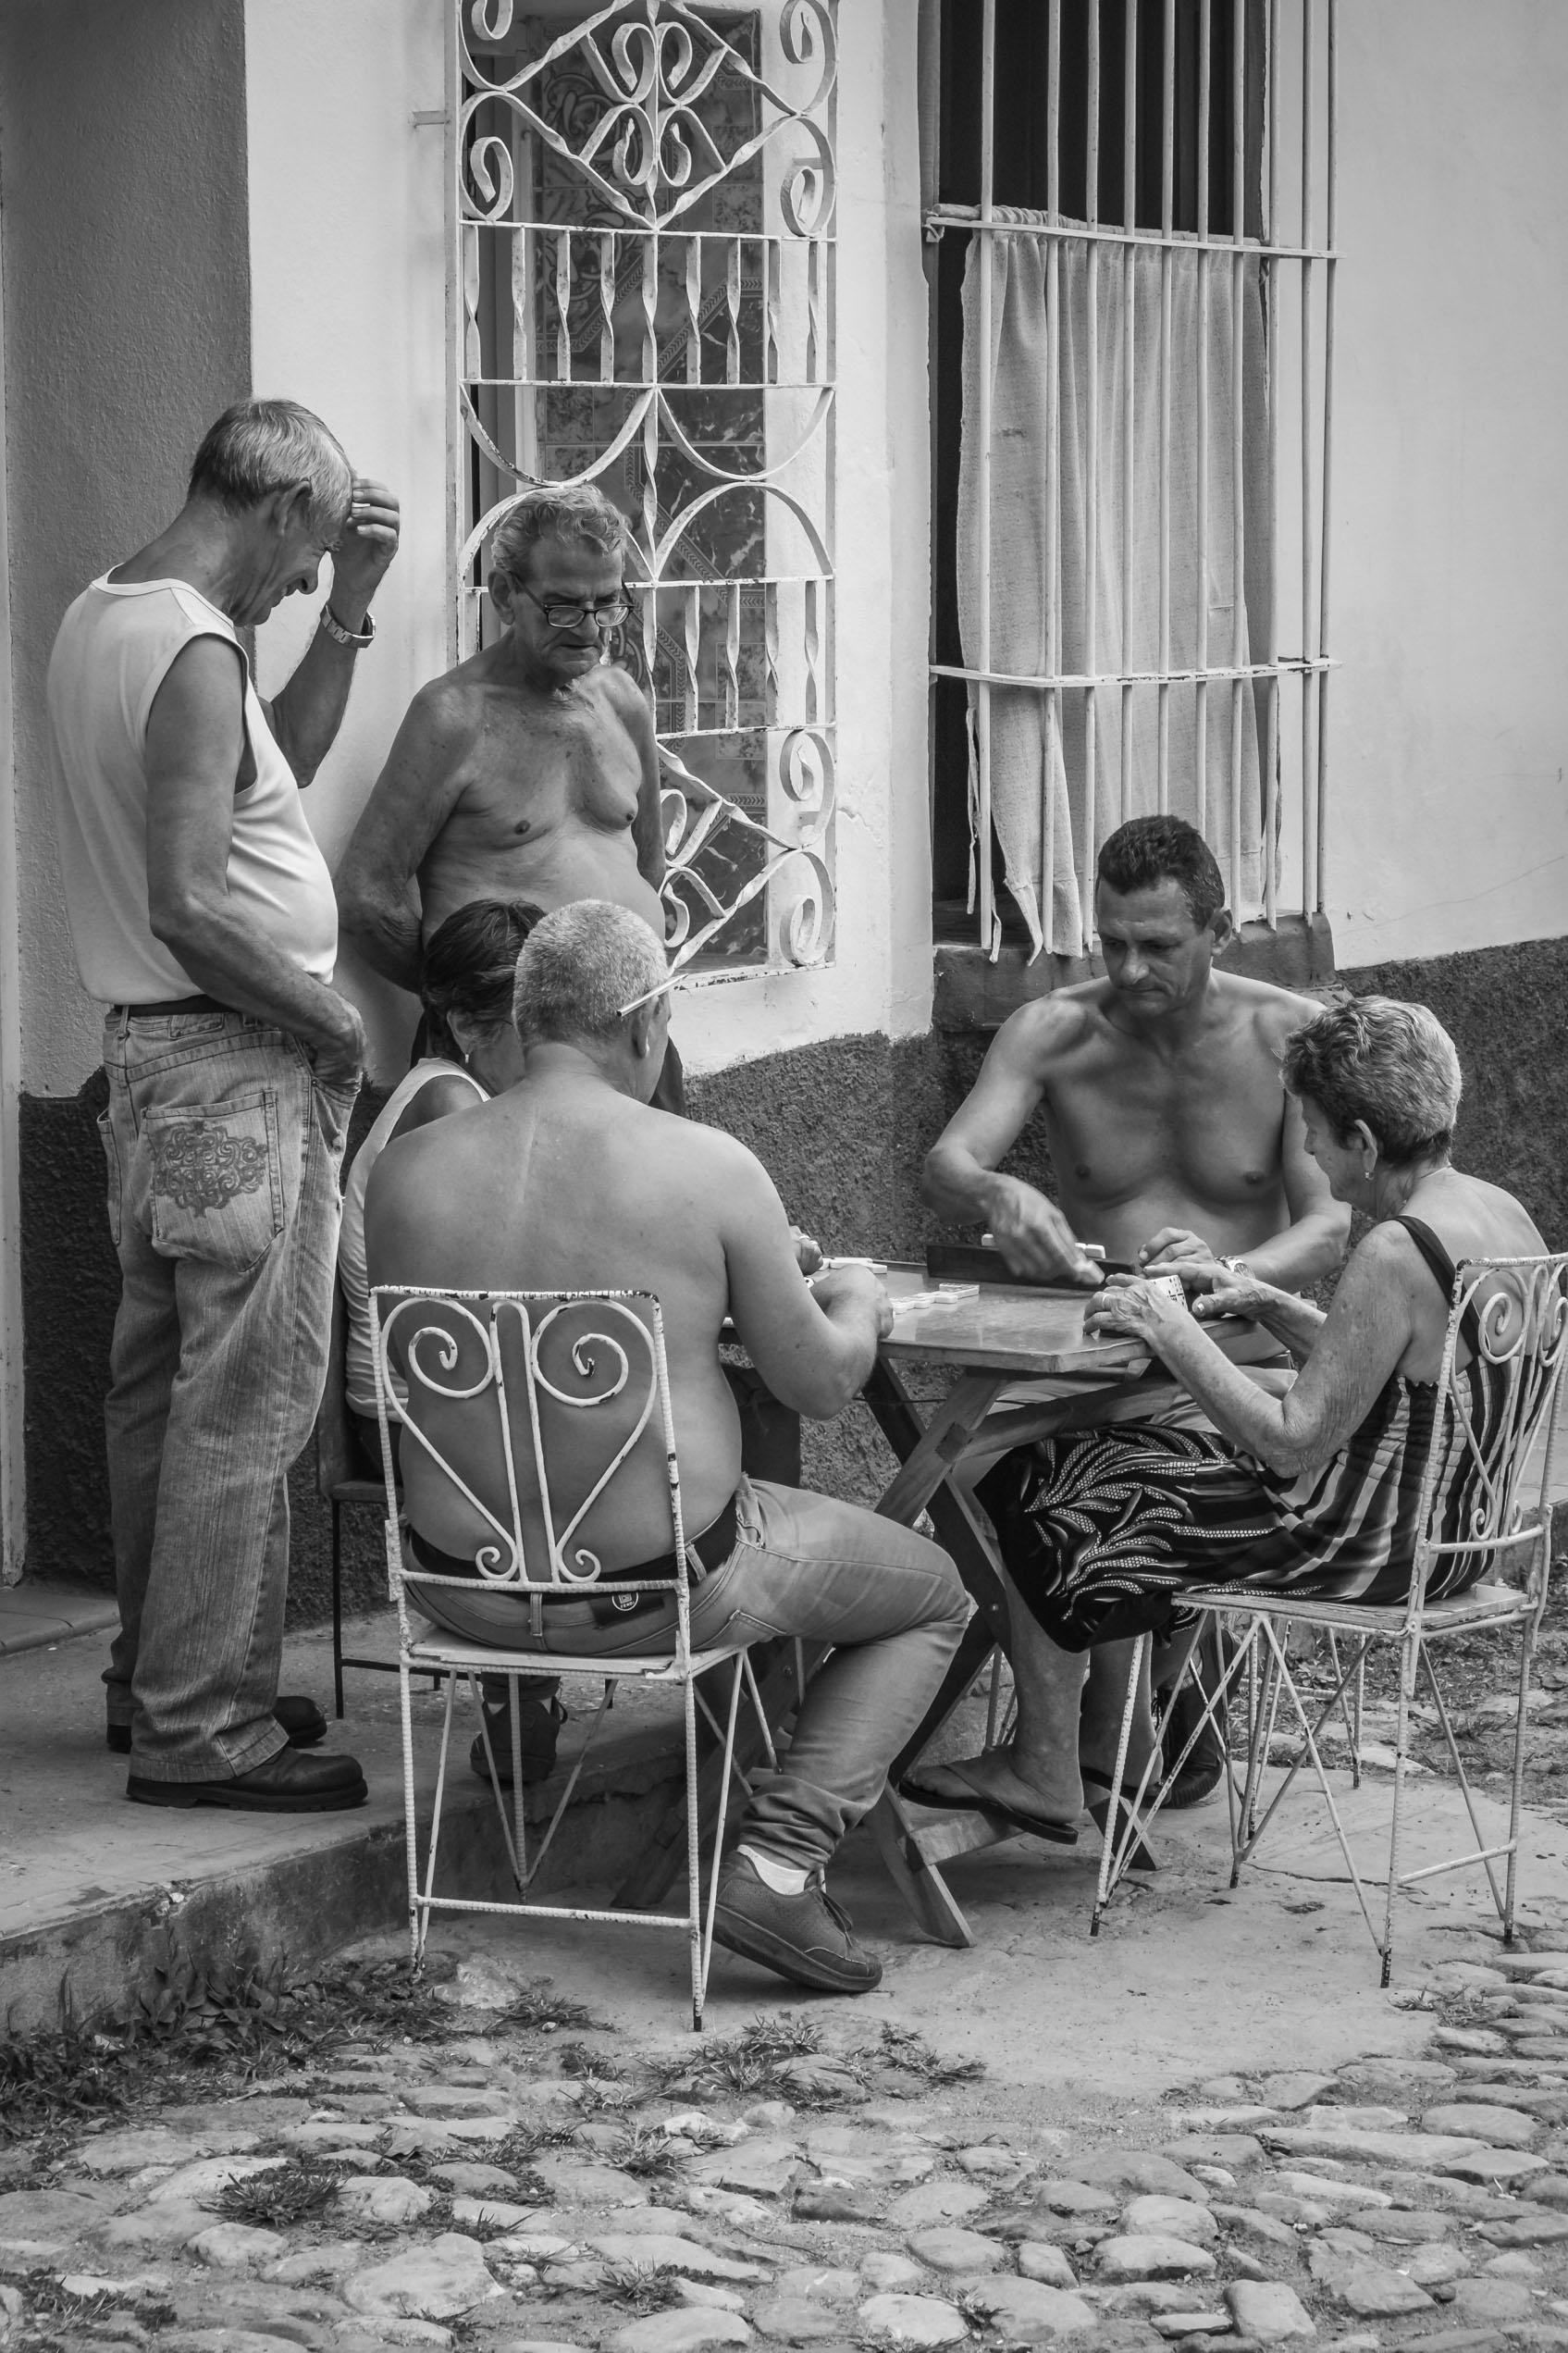 cubains-jouant-rue-trinidad